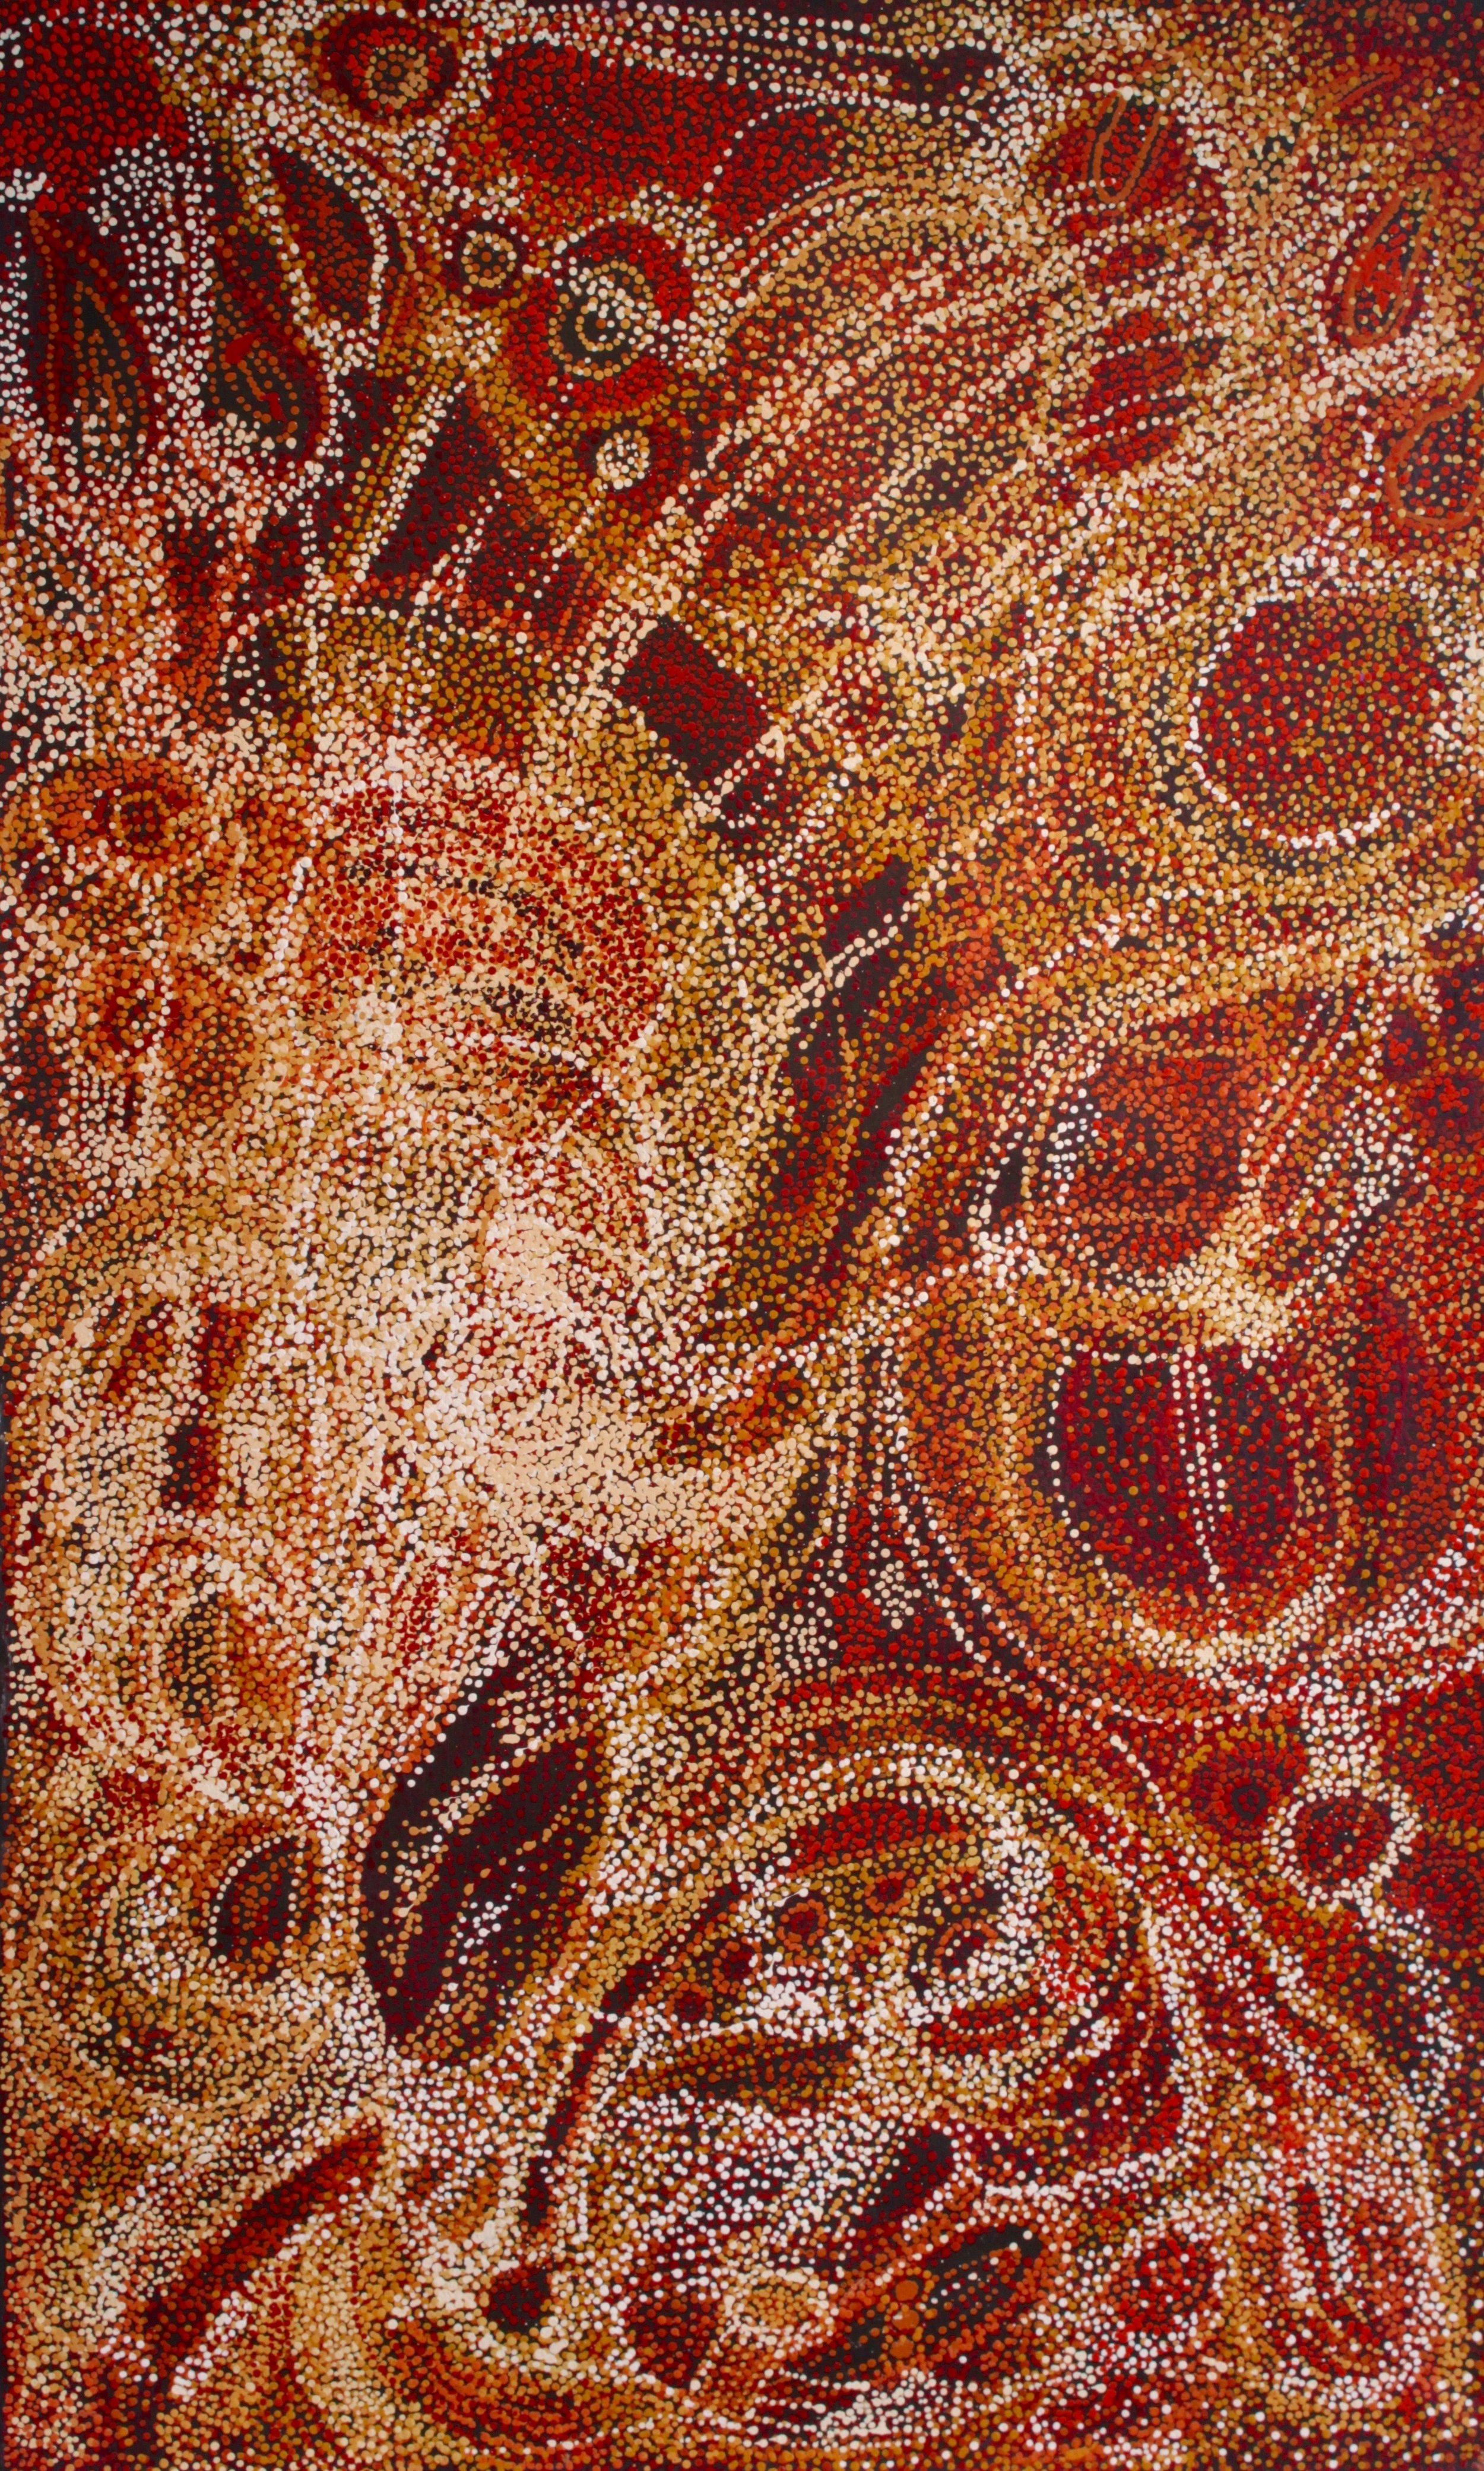 "Nyunmiti Burton  Ngayuku Ngura - My Country   Acrylic on Belgian linen 1220 x 1980mm (48 x 78"") Tjala Arts Catalog #829-16   Price Available upon Request"